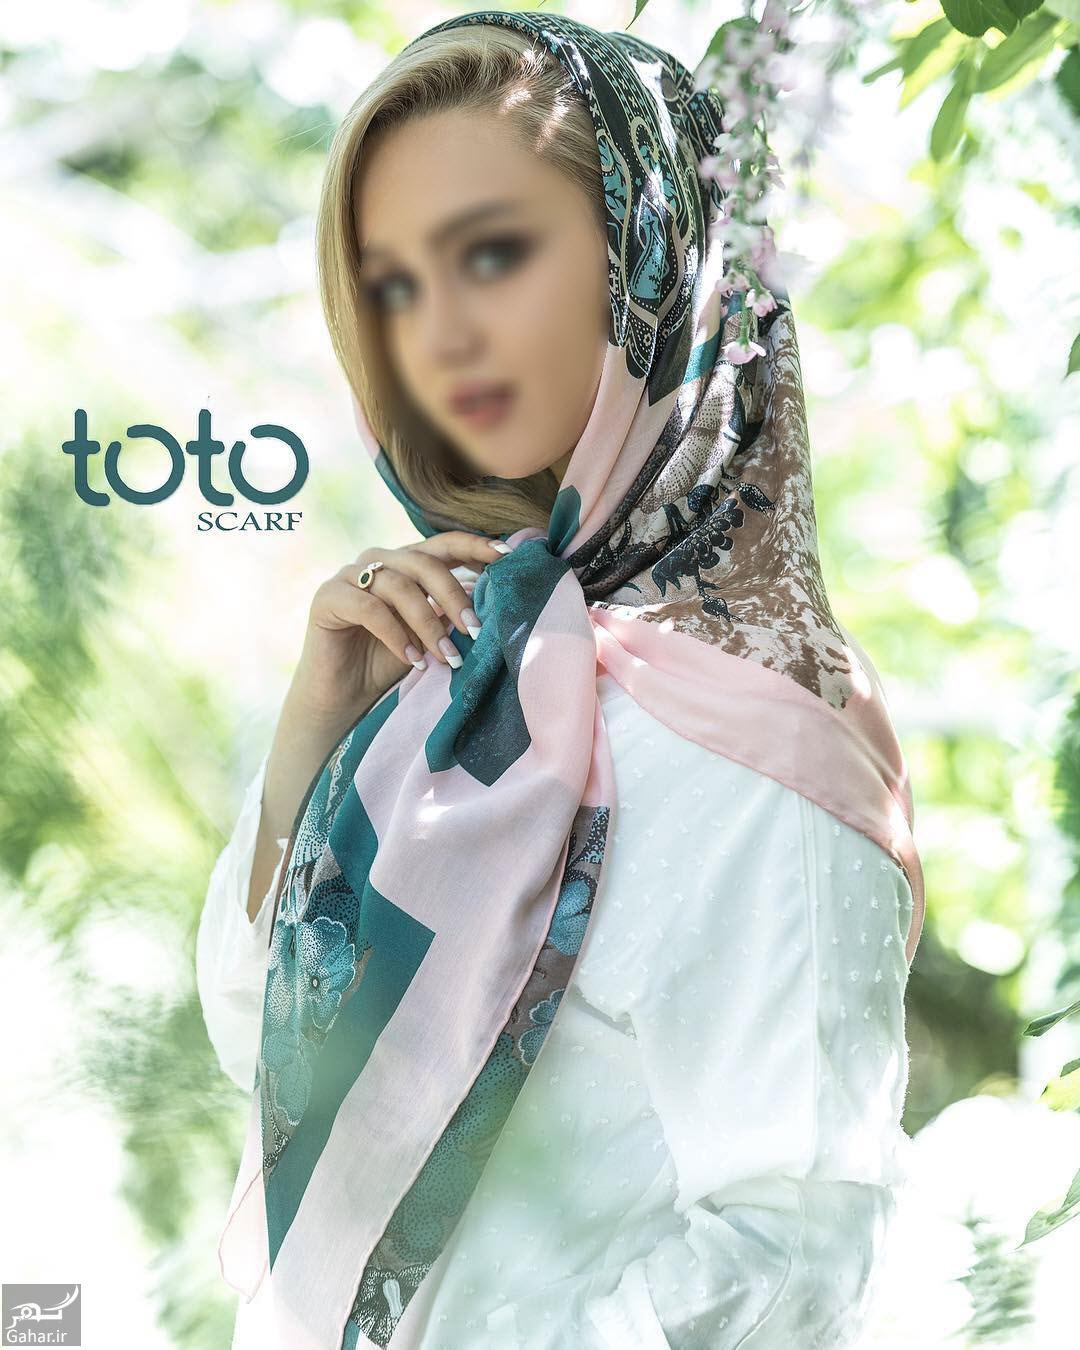 091754 Gahar ir جدیدترین مدل های شال و روسری از برند ایرانی توتو